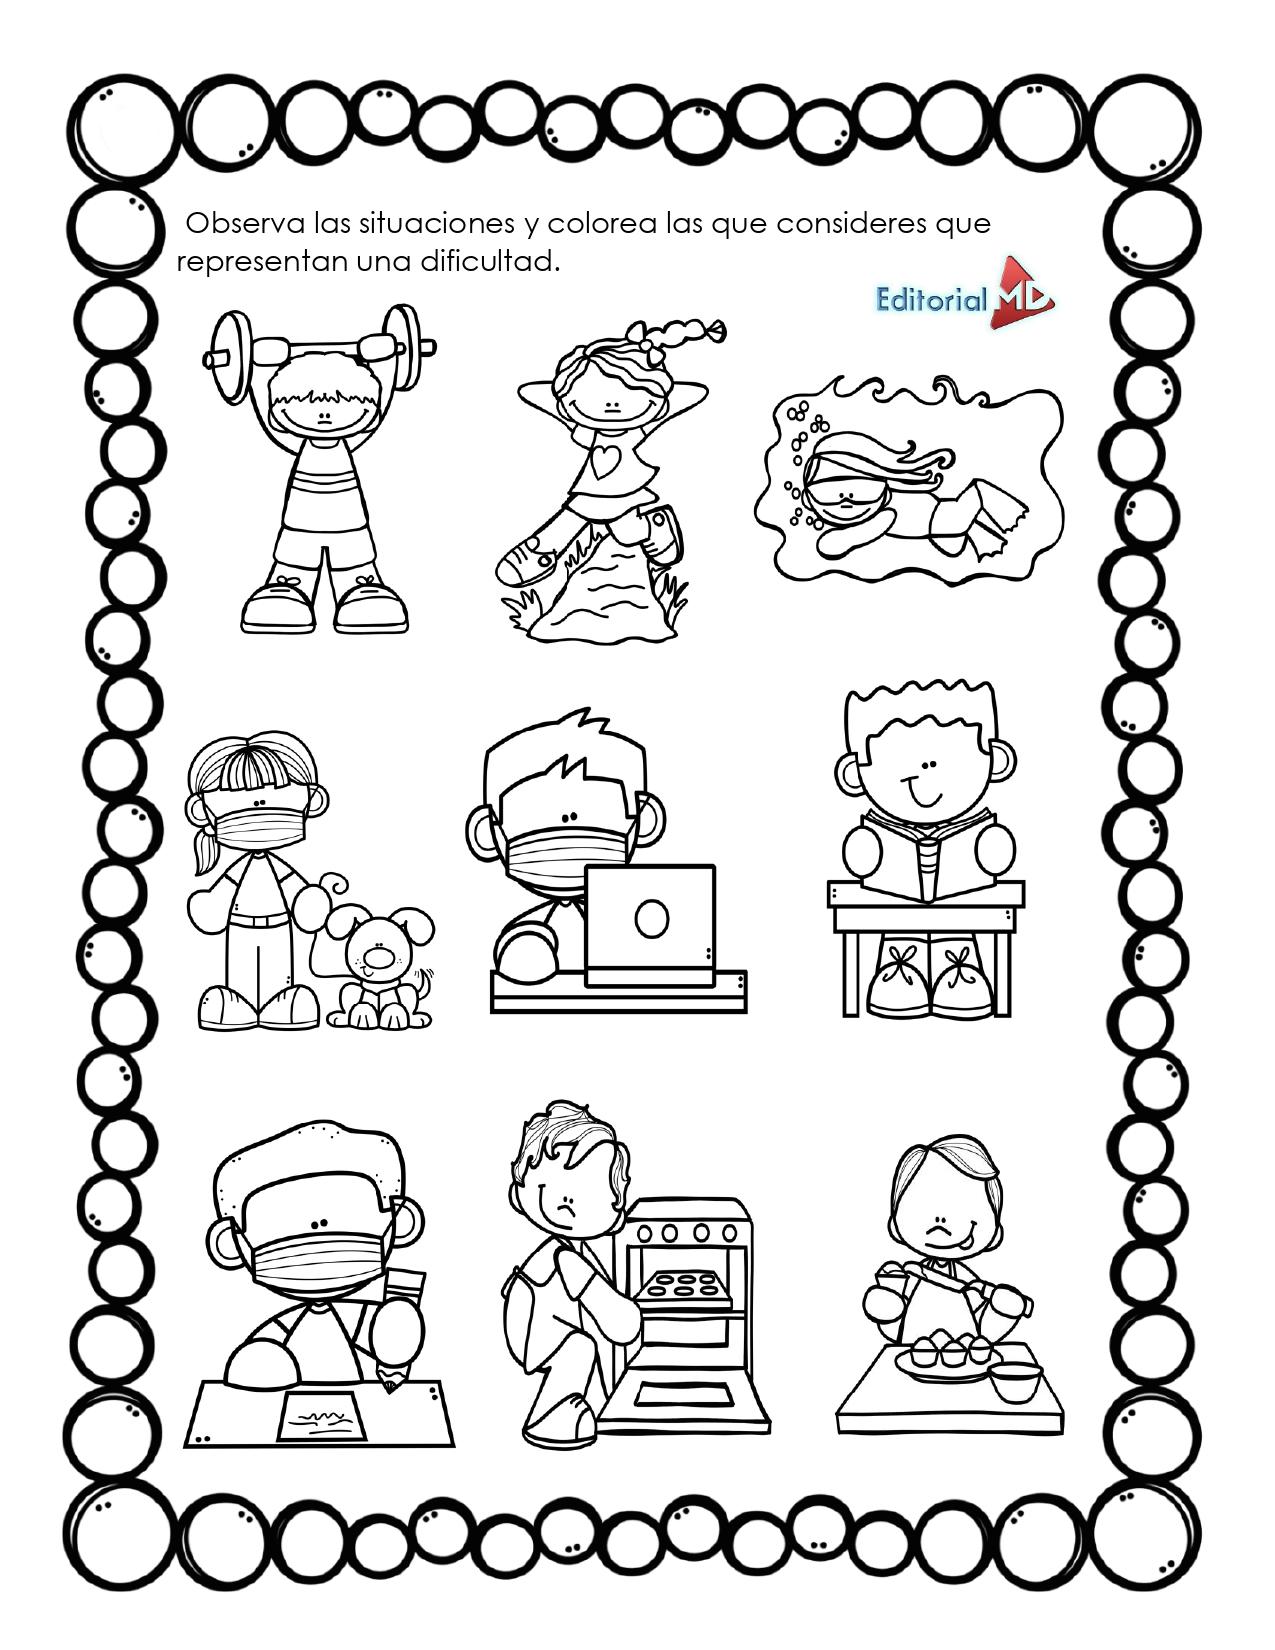 Ejemplo Material de apoyo semana 24 preescolar 02